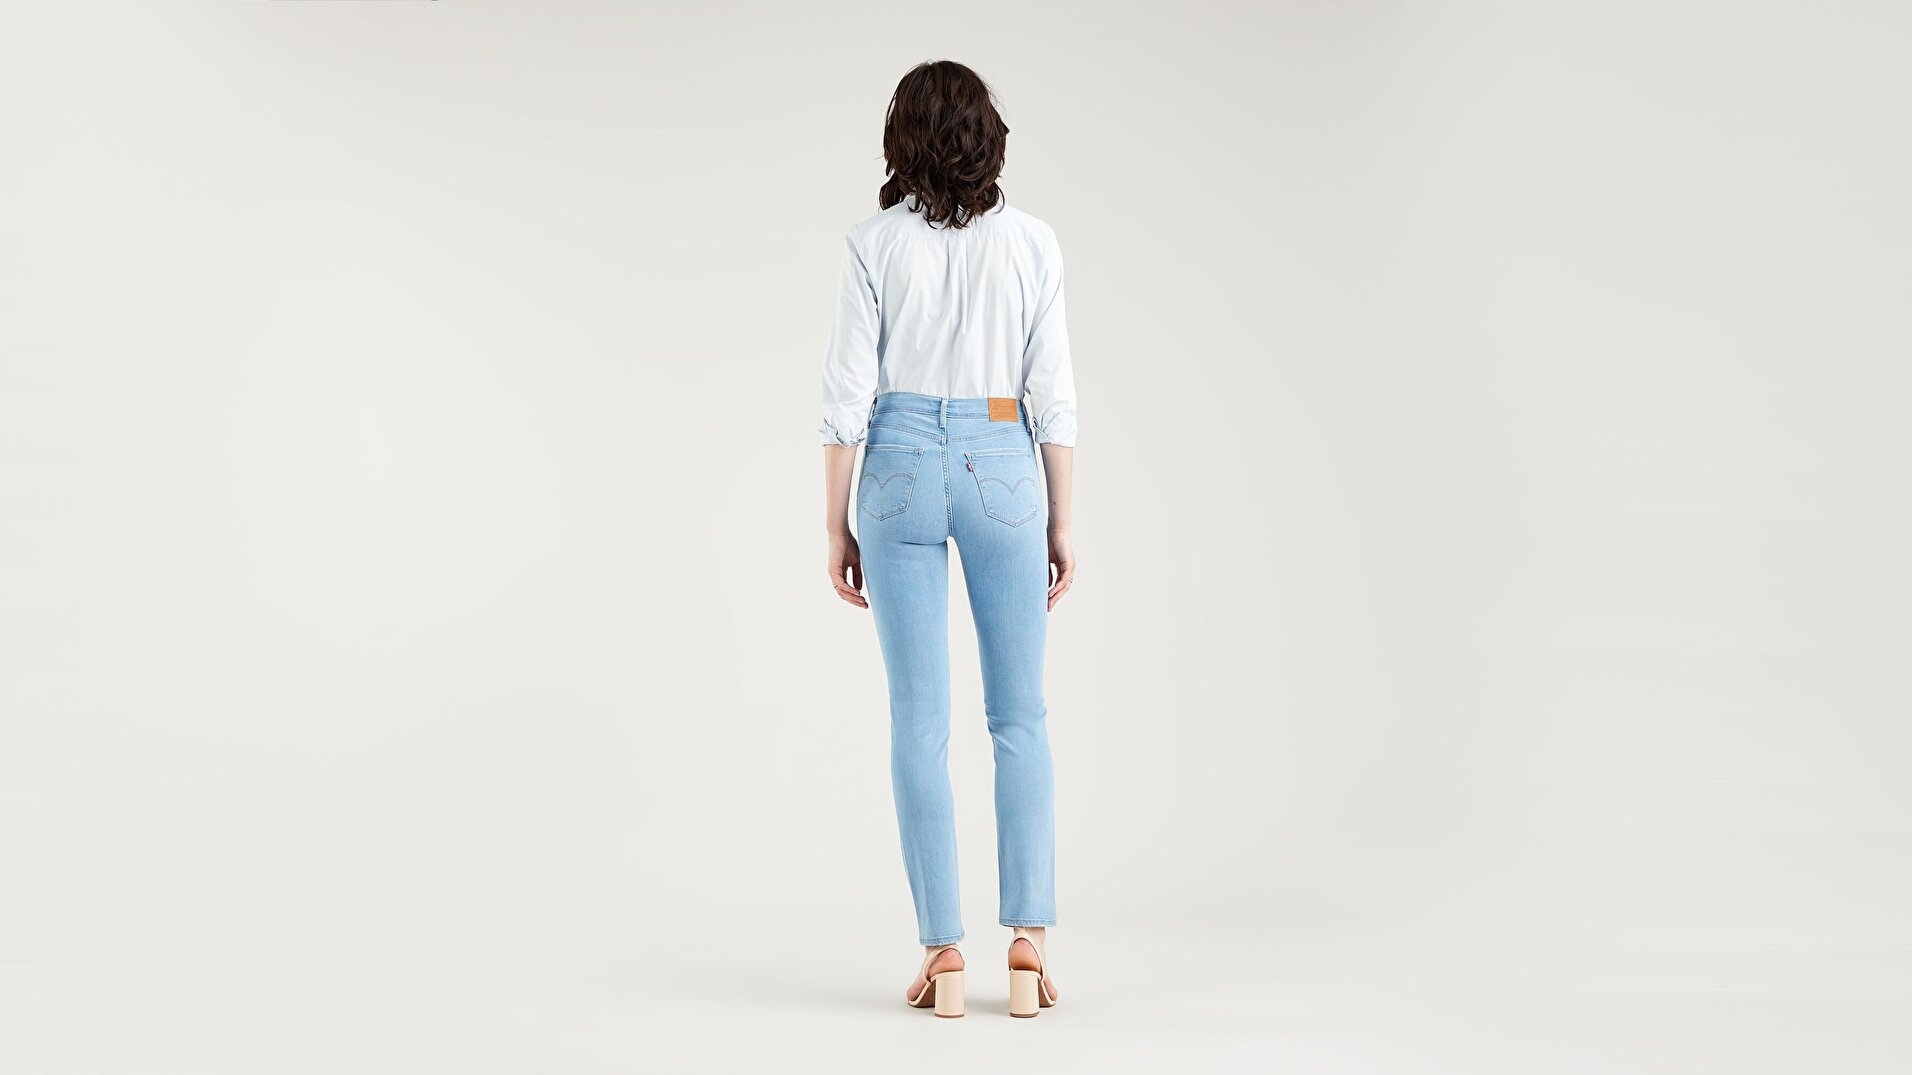 724™ High Rise Straight Kadın Jean Pantolon - Rio Aura - Blue